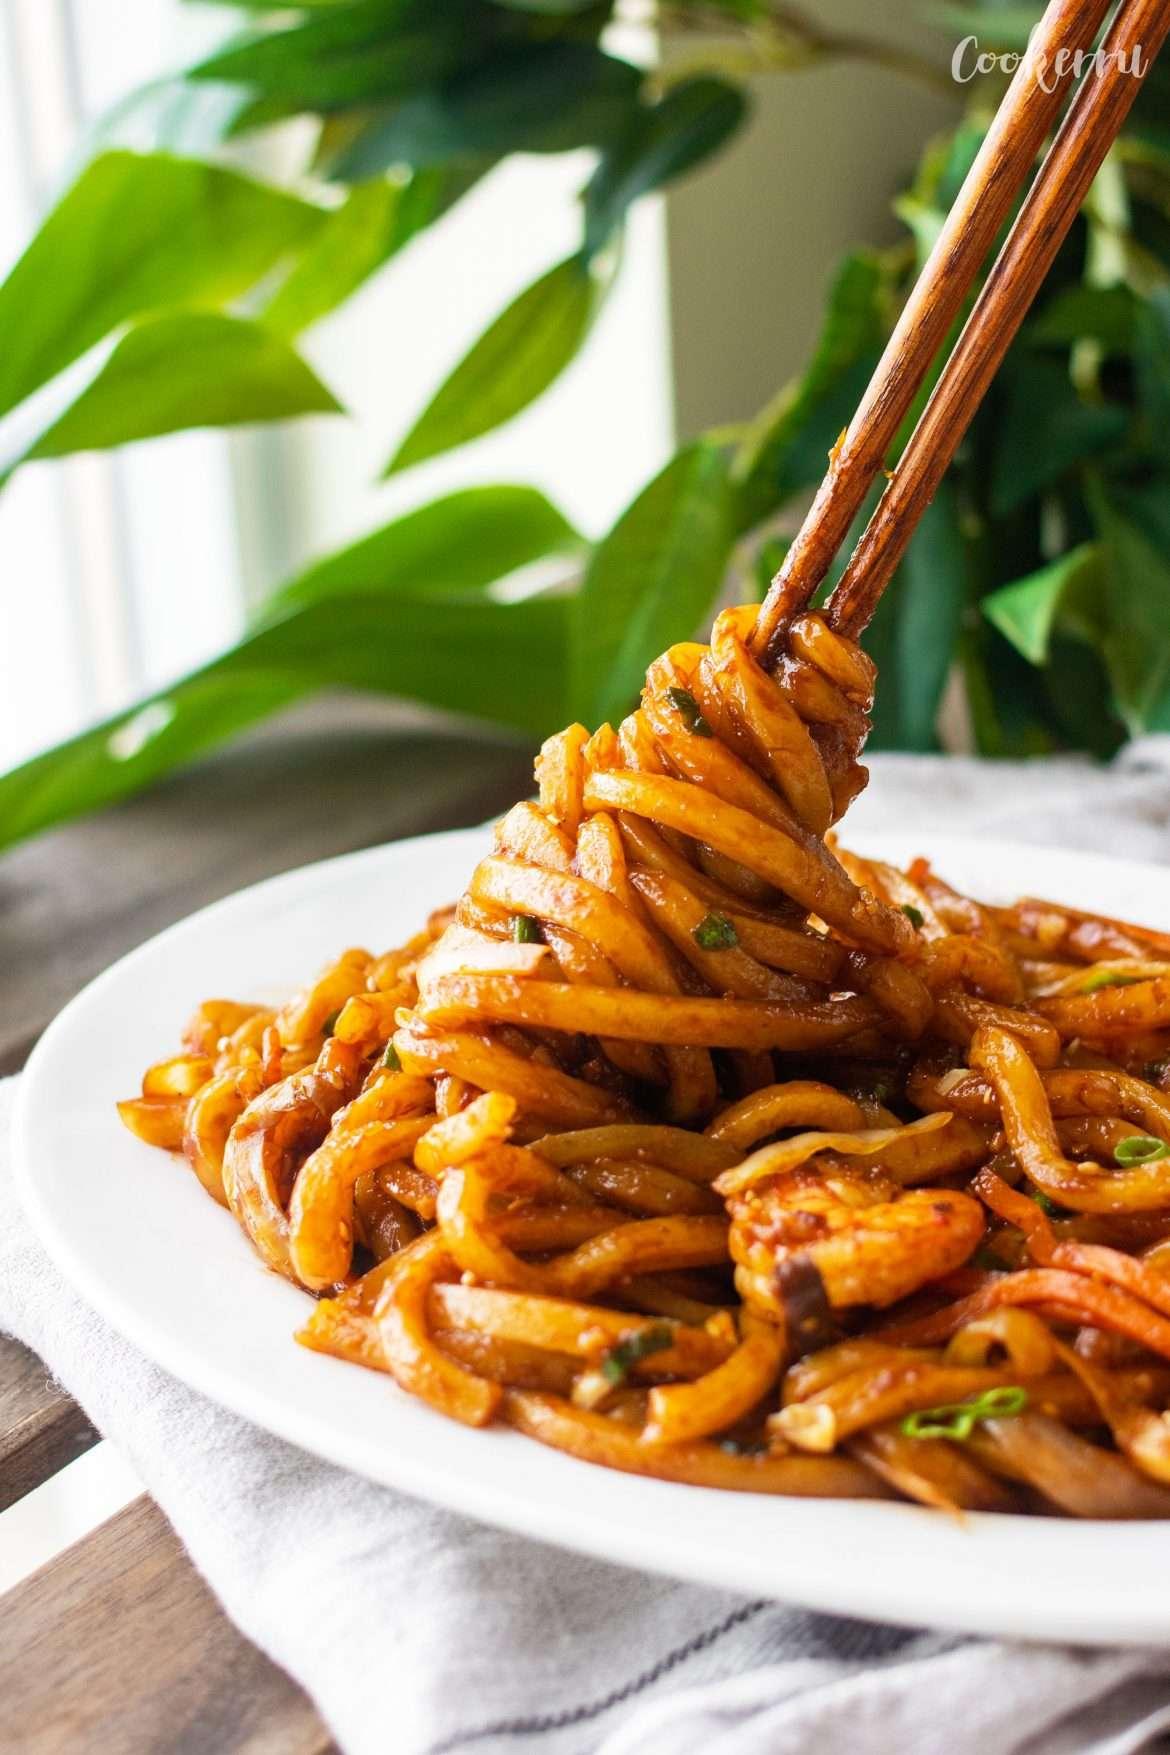 15-Minute Yaki Udon with Shrimp